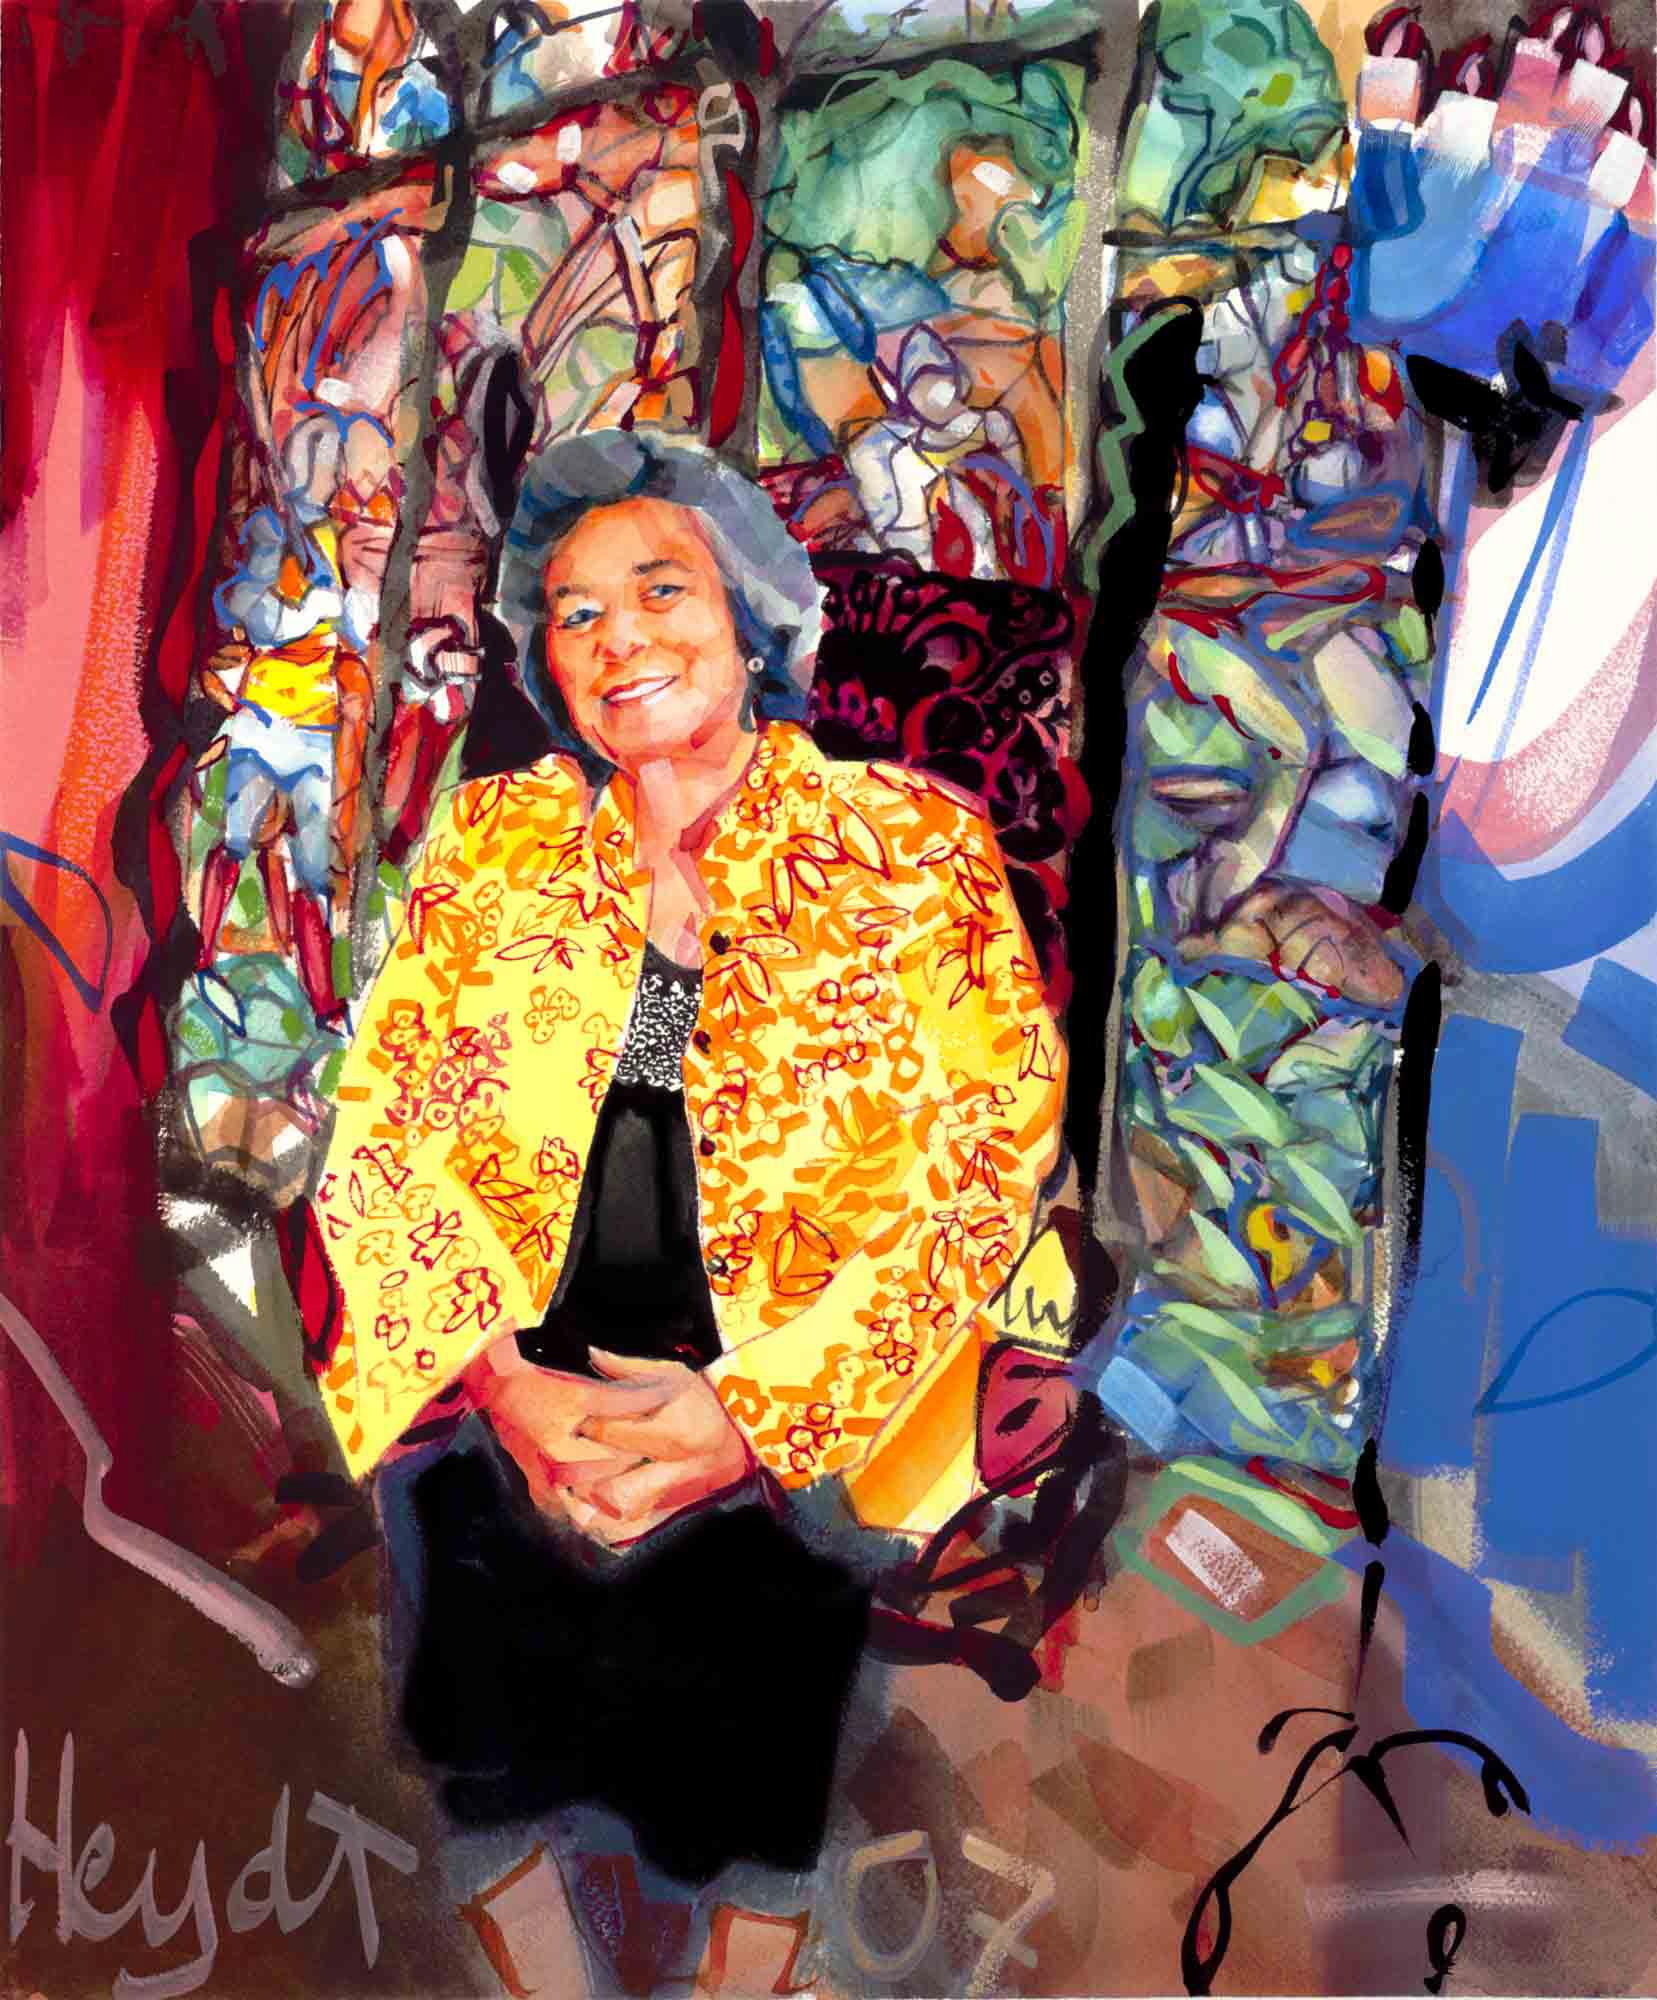 NewportantIII-stained glass Woman.jpg